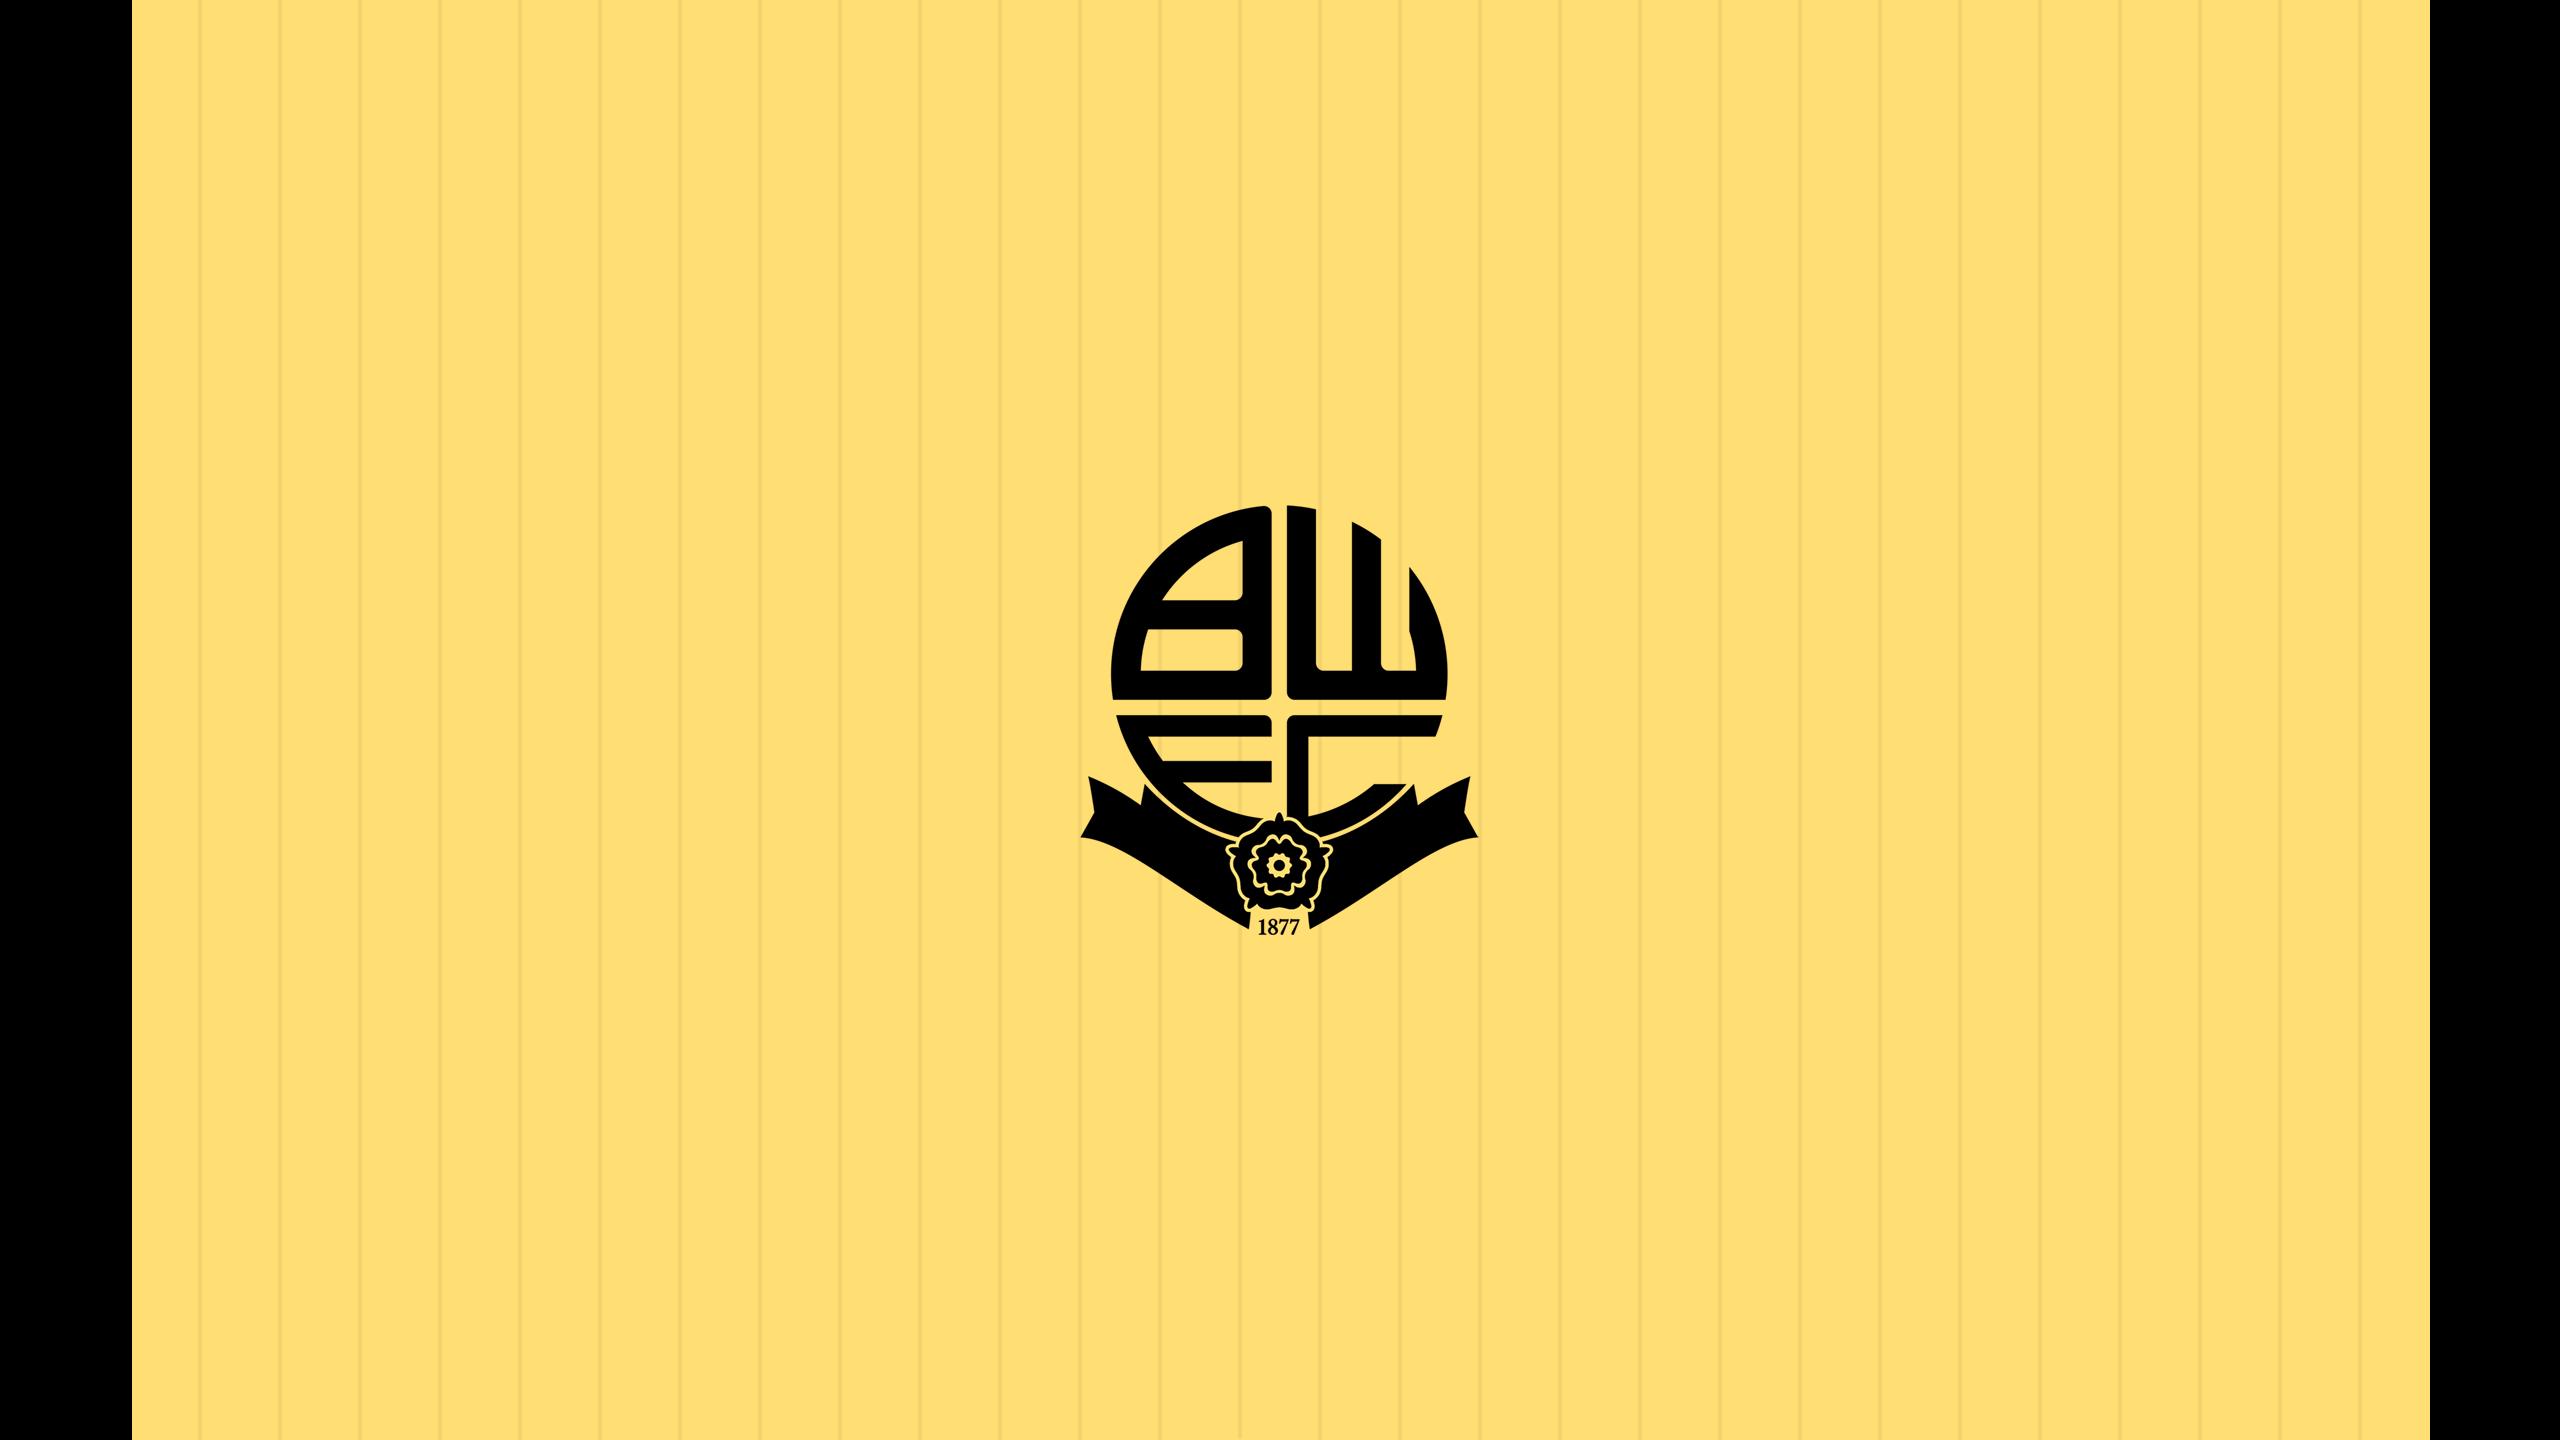 Bolton Wanderers FC (Alt)